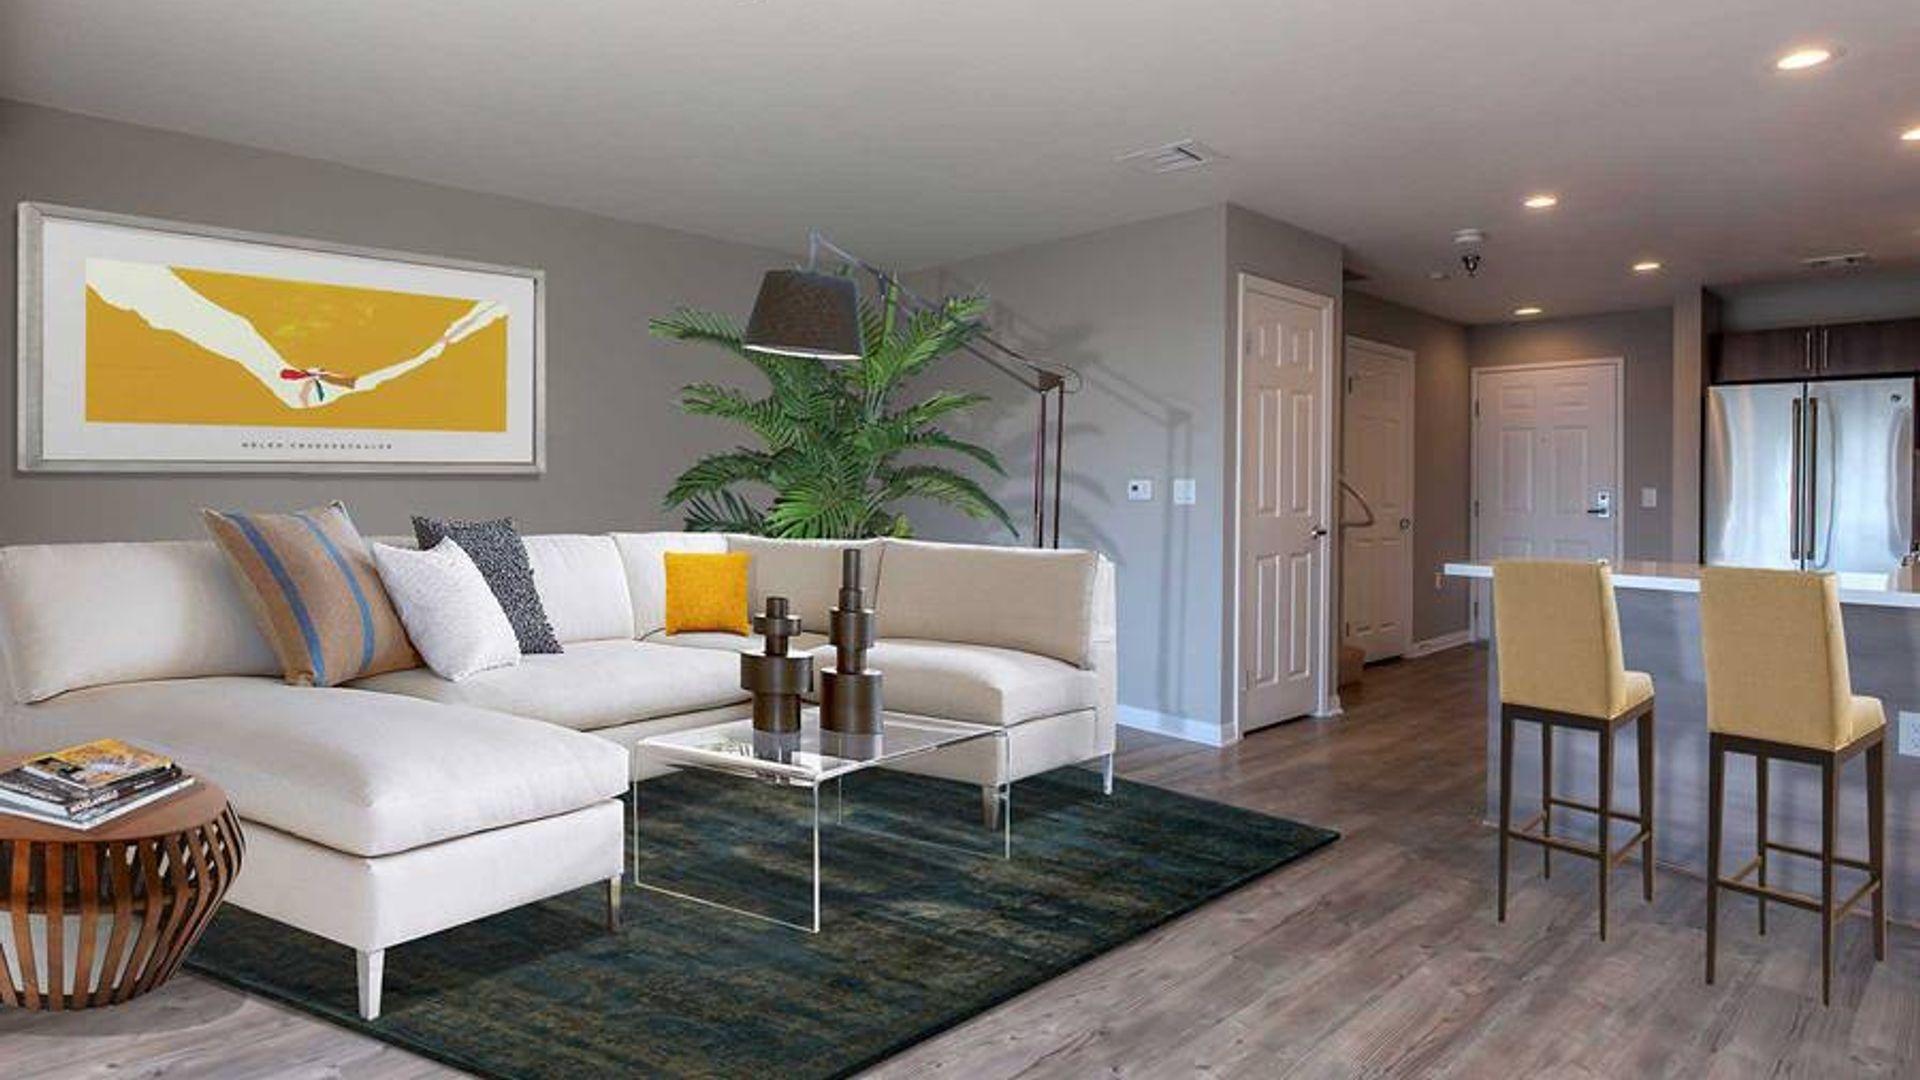 2 bed apartment at 2827 Euclid Street, Santa Monica, CA ...